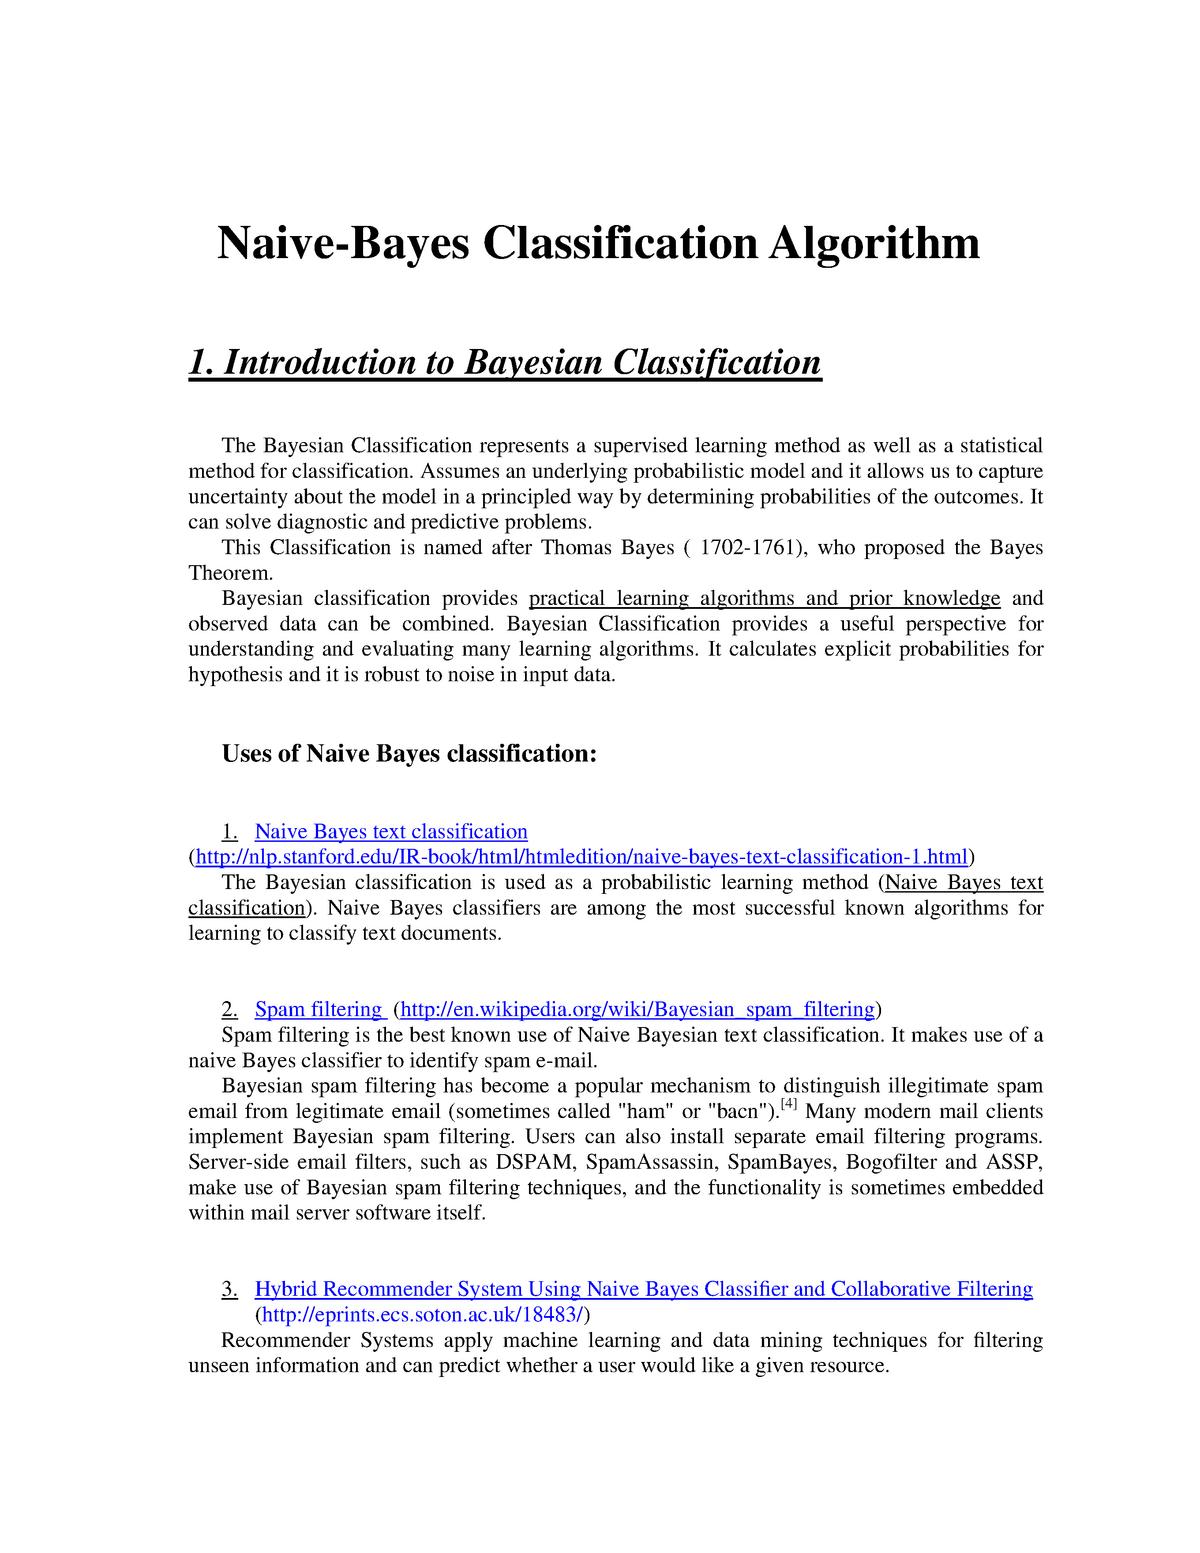 Lab4-Naive Bayes - notes - Entrepreneurship - StuDocu